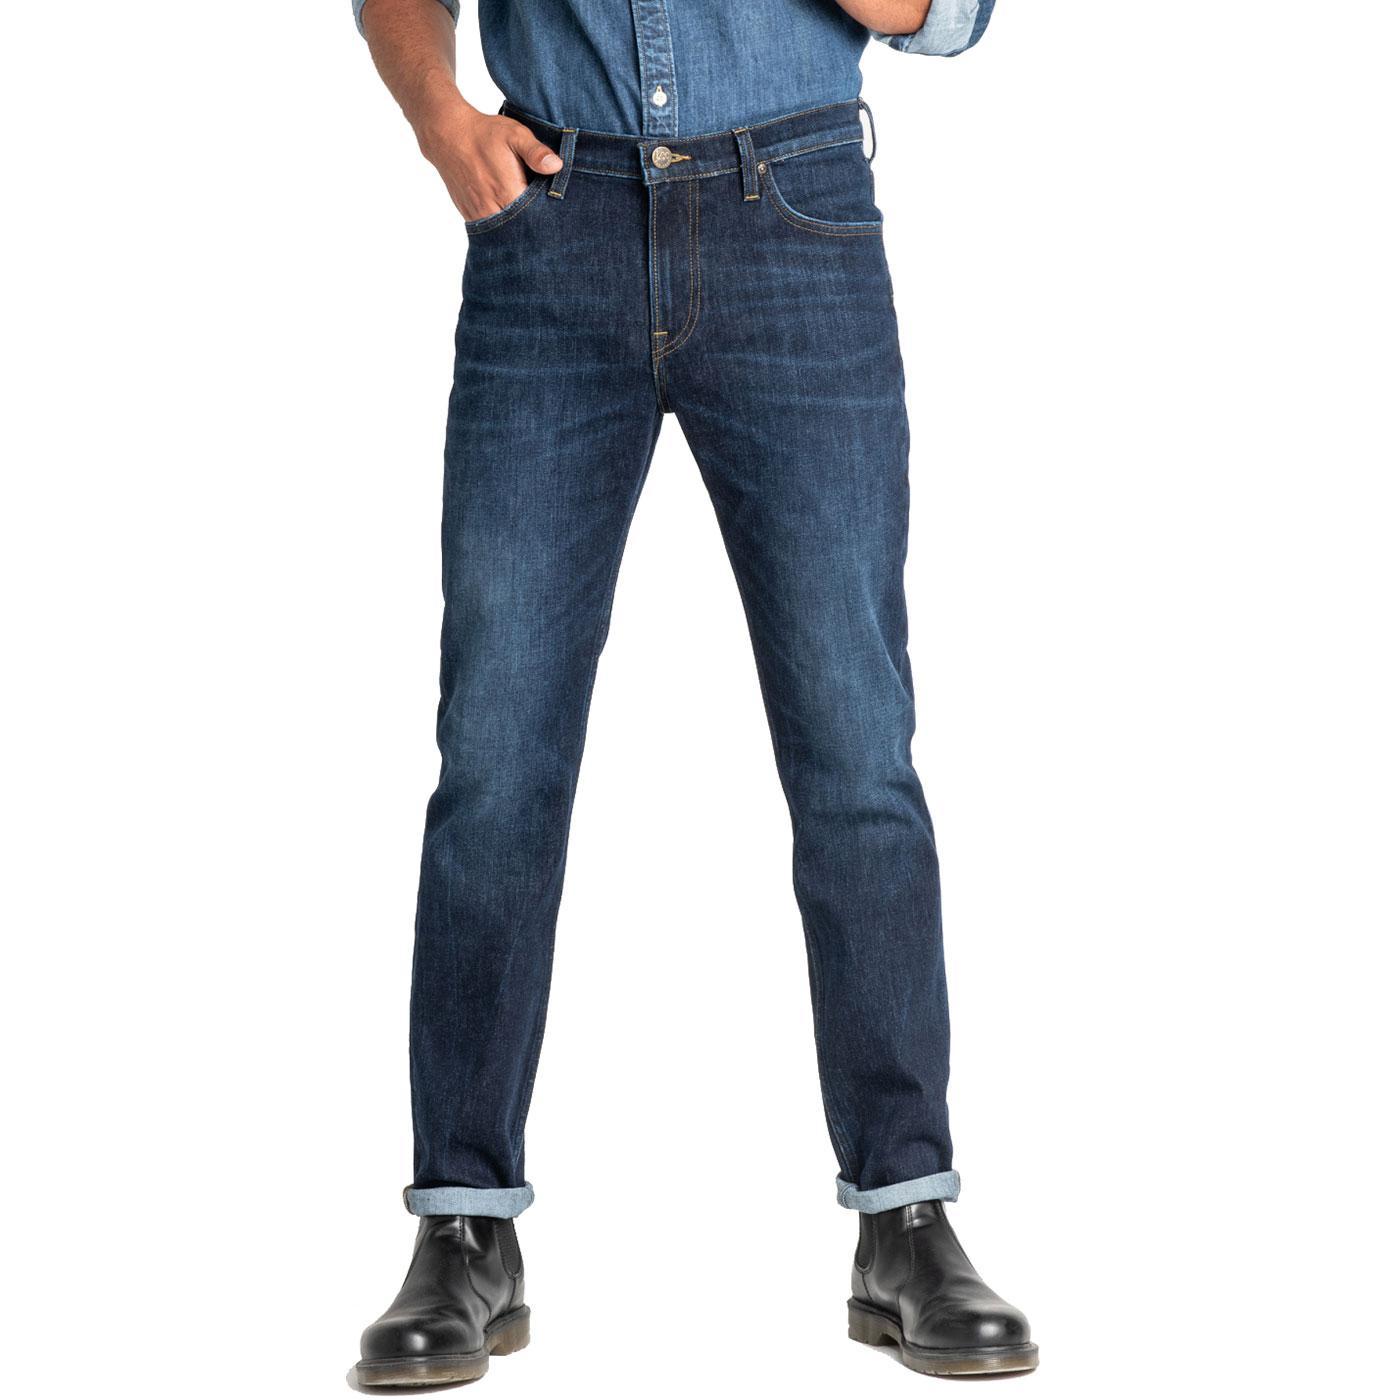 Slim Rider LEE JEANS Retro Denim Jeans DARK POOL